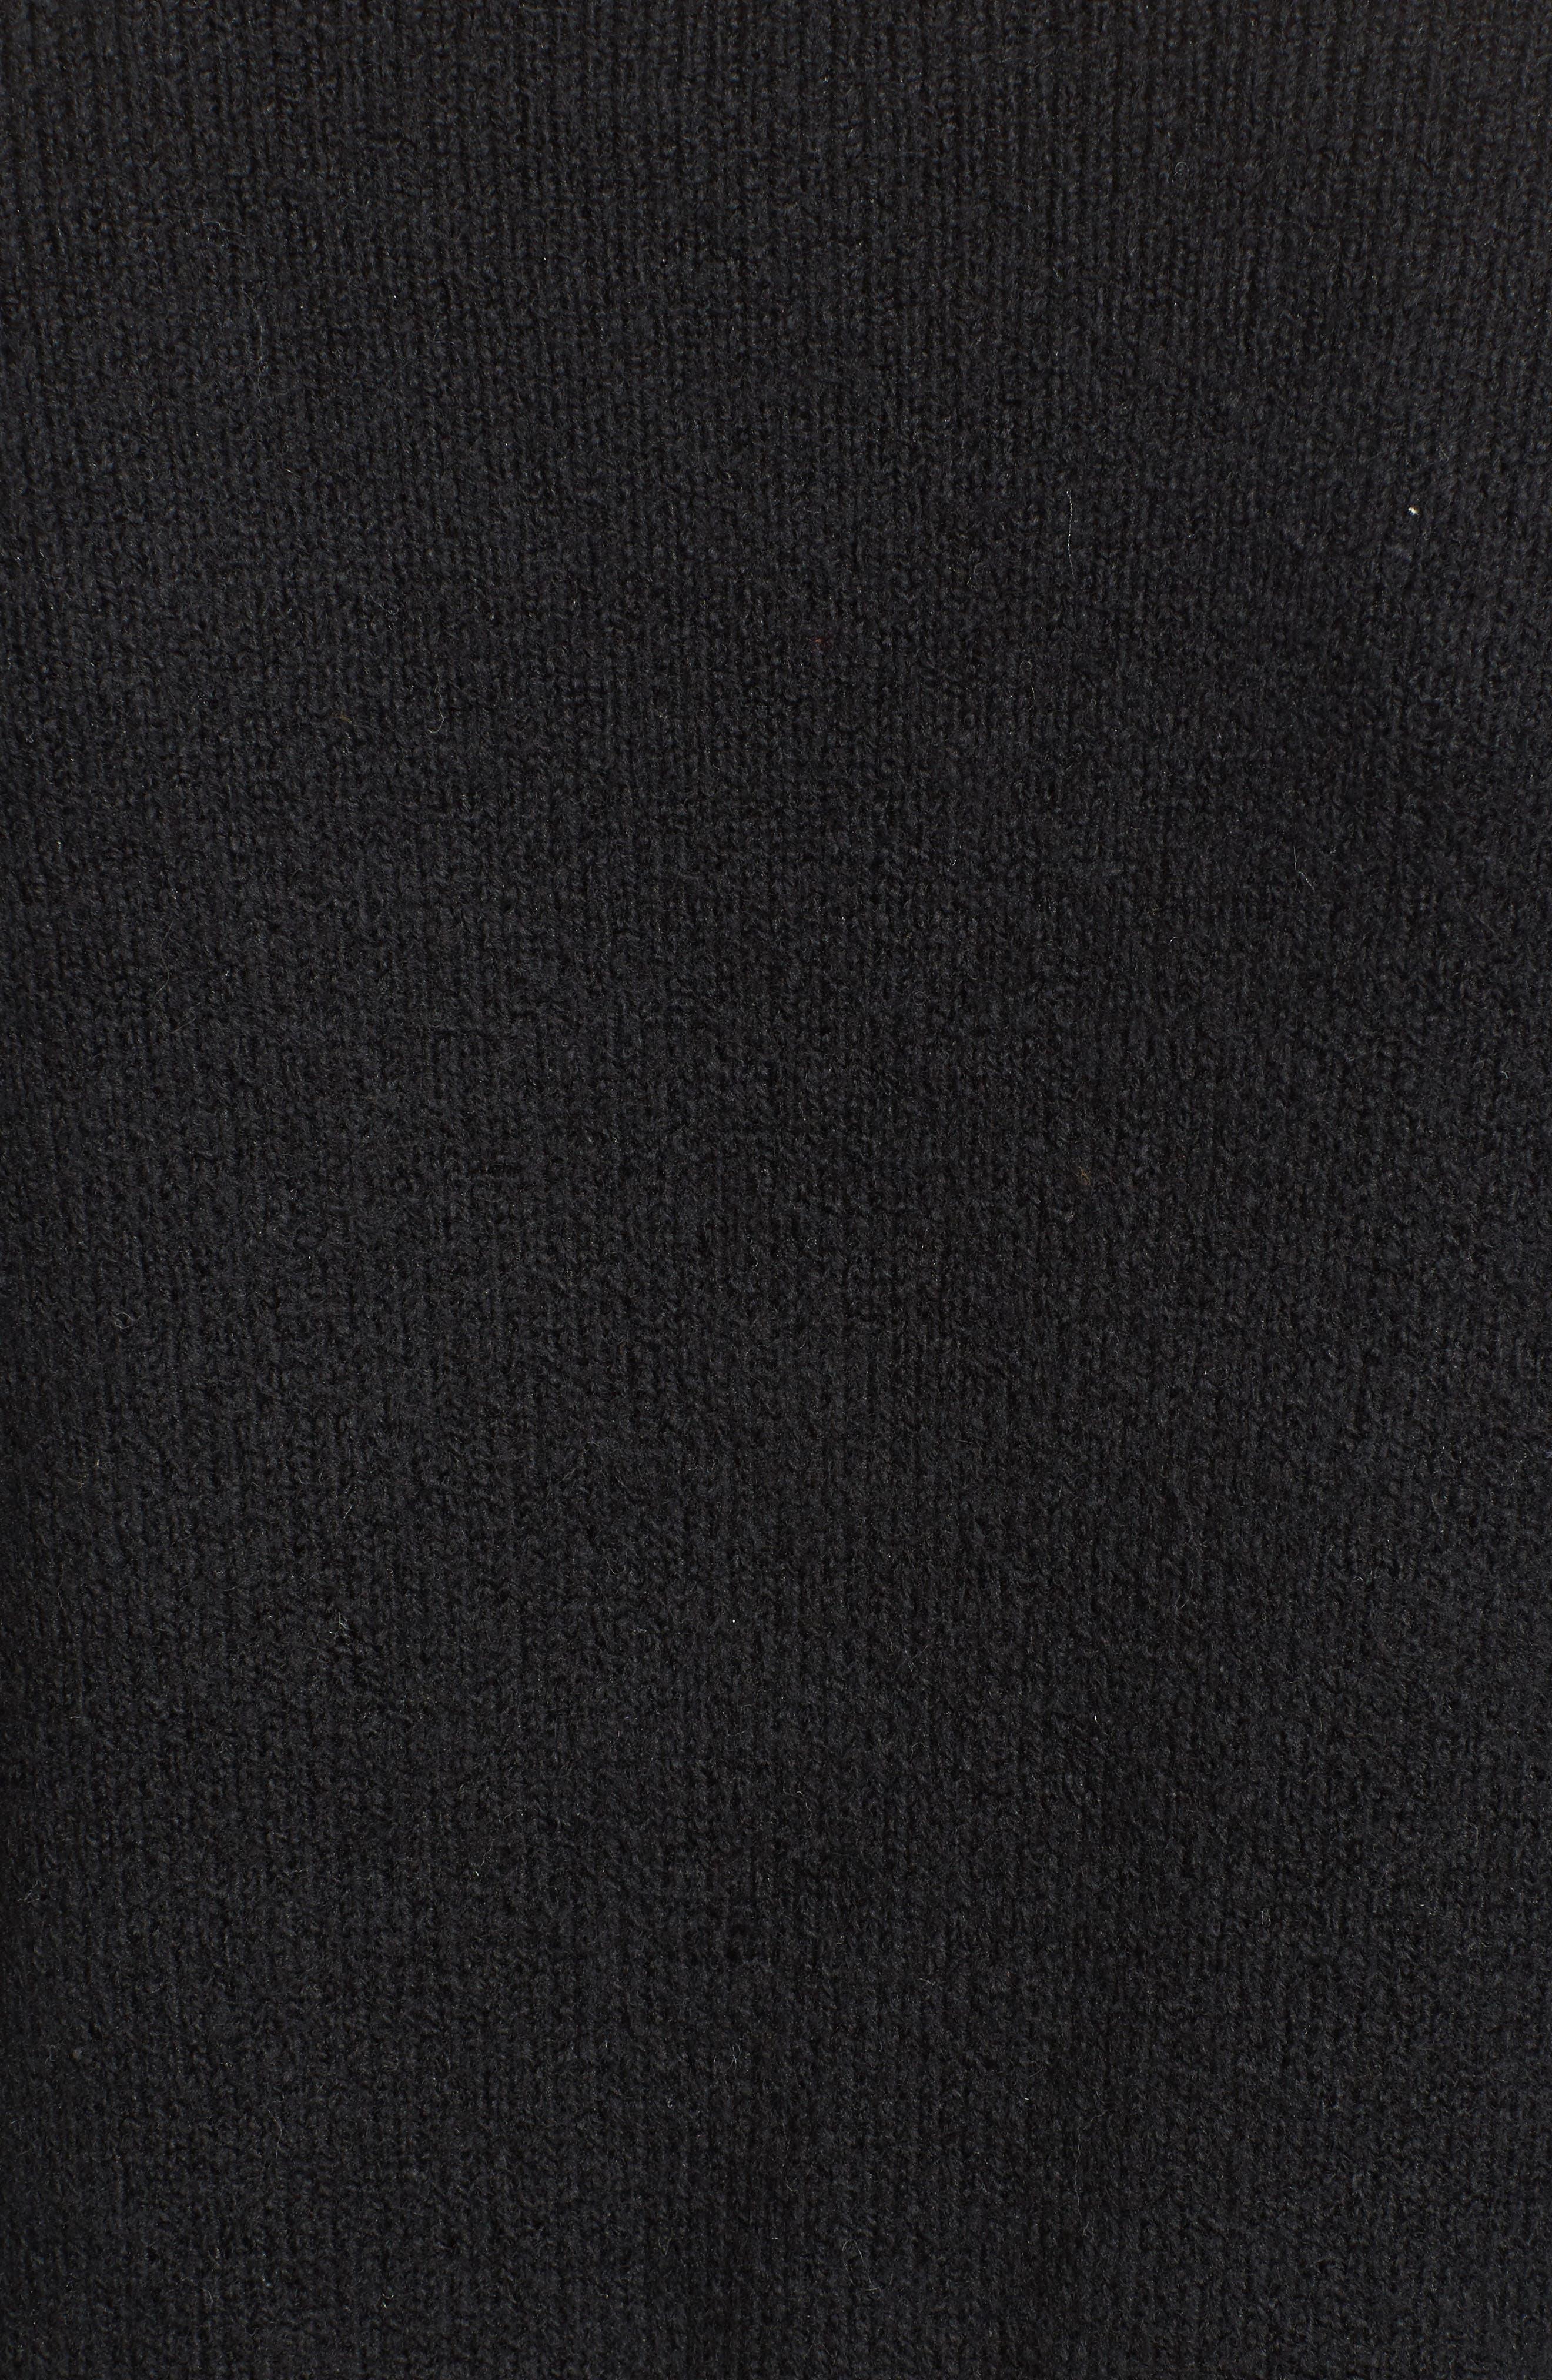 V-Neck High/Low Sweater,                             Alternate thumbnail 5, color,                             Black